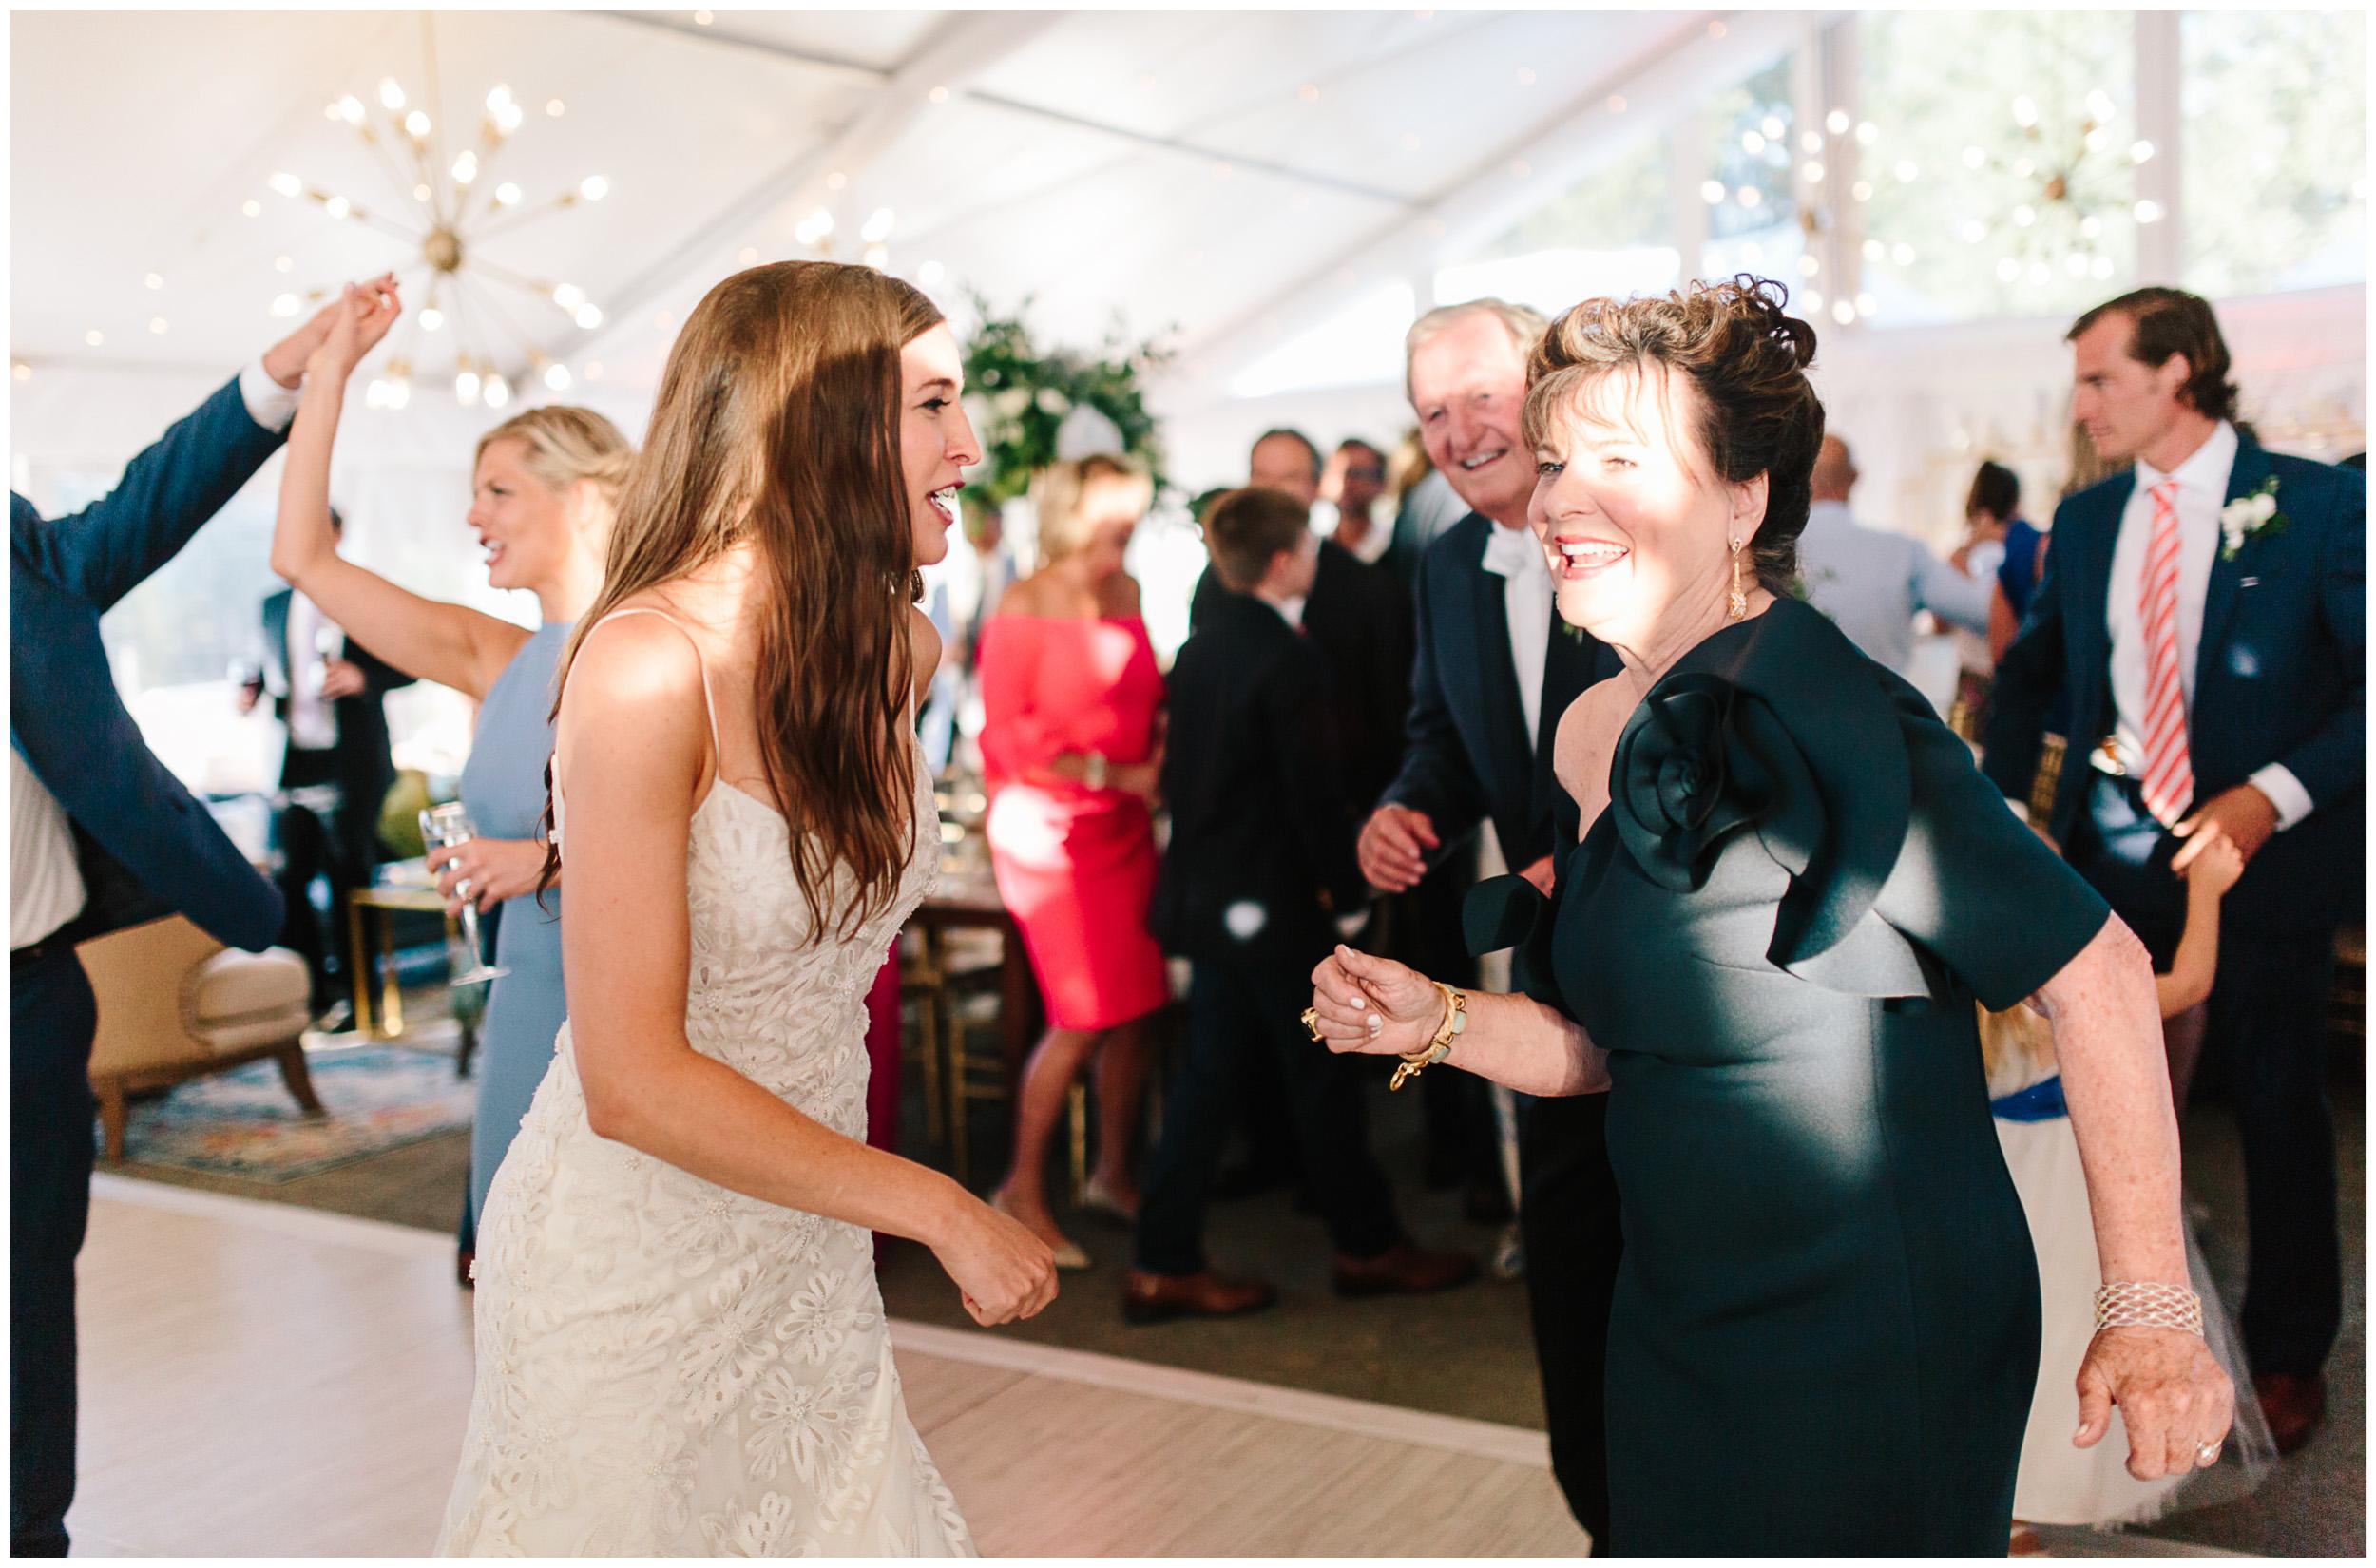 crested_butte_wedding_115.jpg